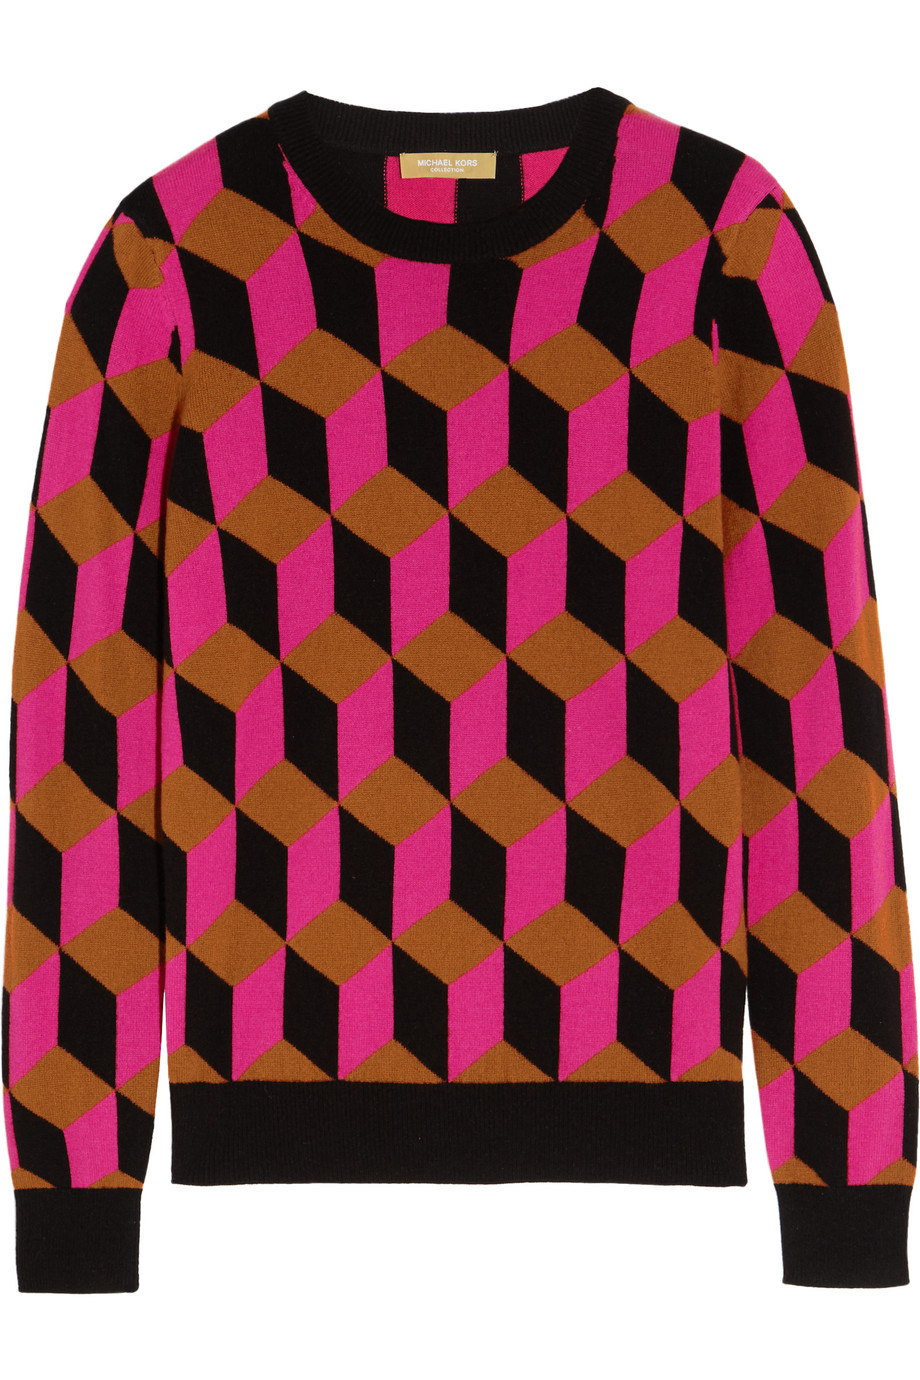 Hexagon-Intarsia Cashmere Sweater, Fuchsia, Women's, Size: XS